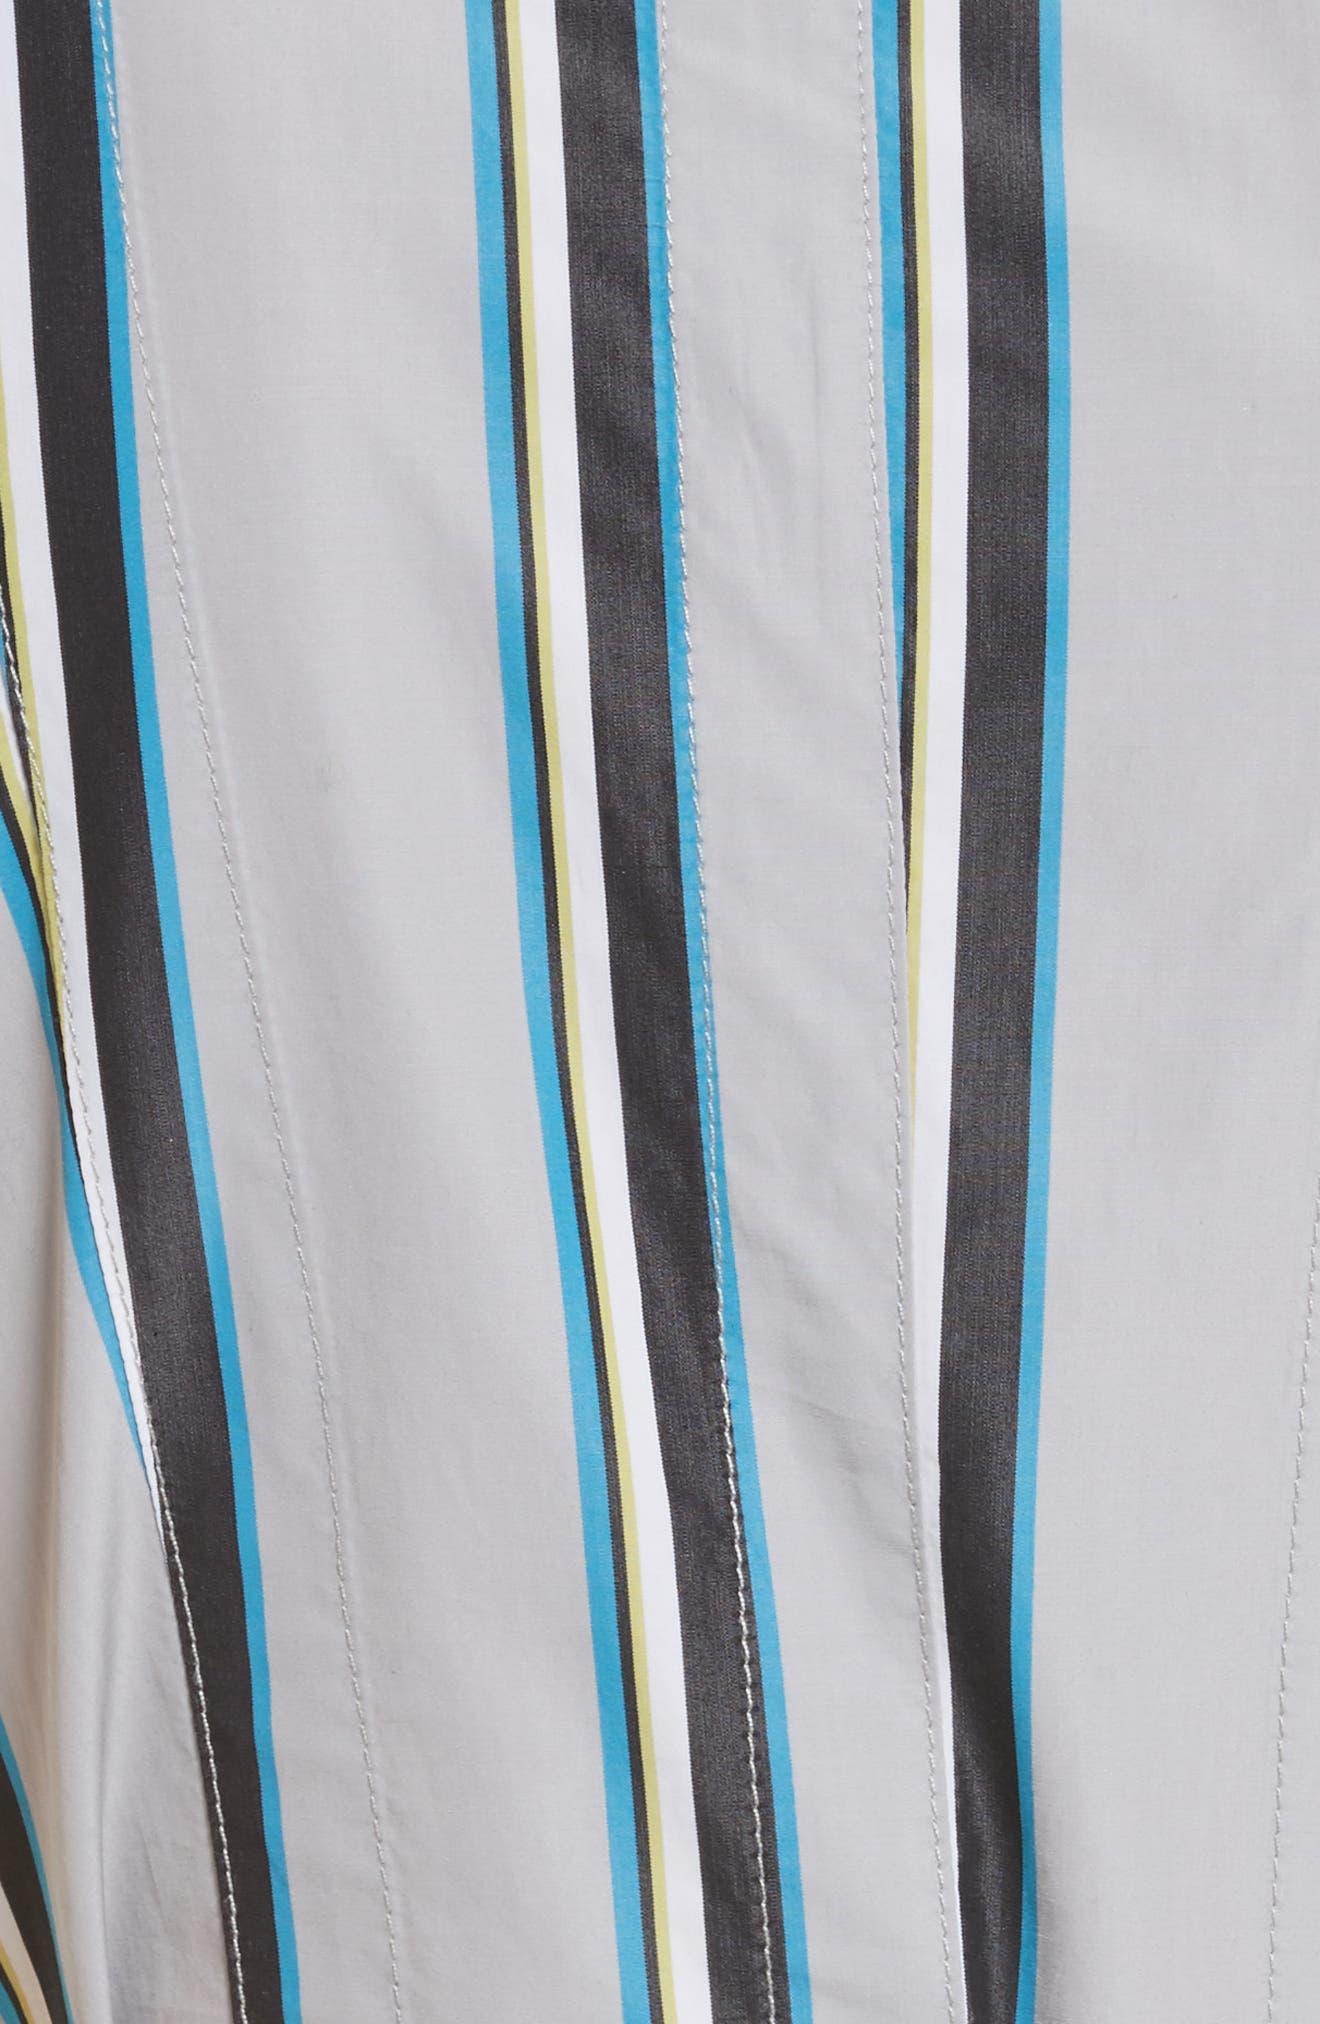 Diane von Furstenberg Stripe Belted Maxi Dress,                             Alternate thumbnail 5, color,